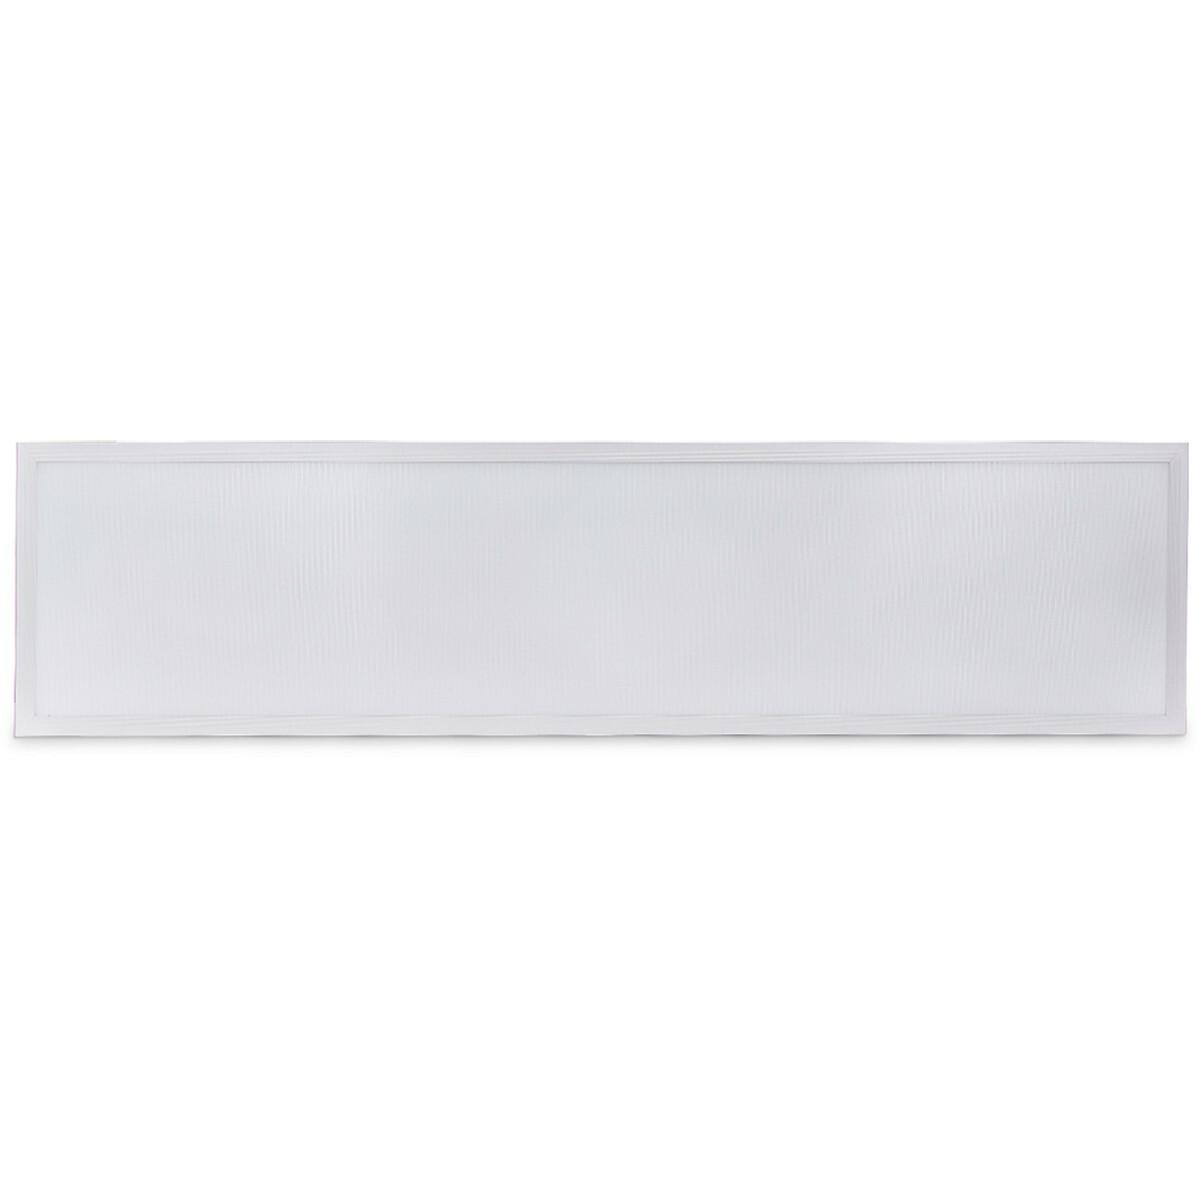 LED Paneel - Aigi Hyron - 30x120 - Aanpasbare Kleur CCT - 32W UGR19 - Inbouw - Vierkant - Mat Wit -